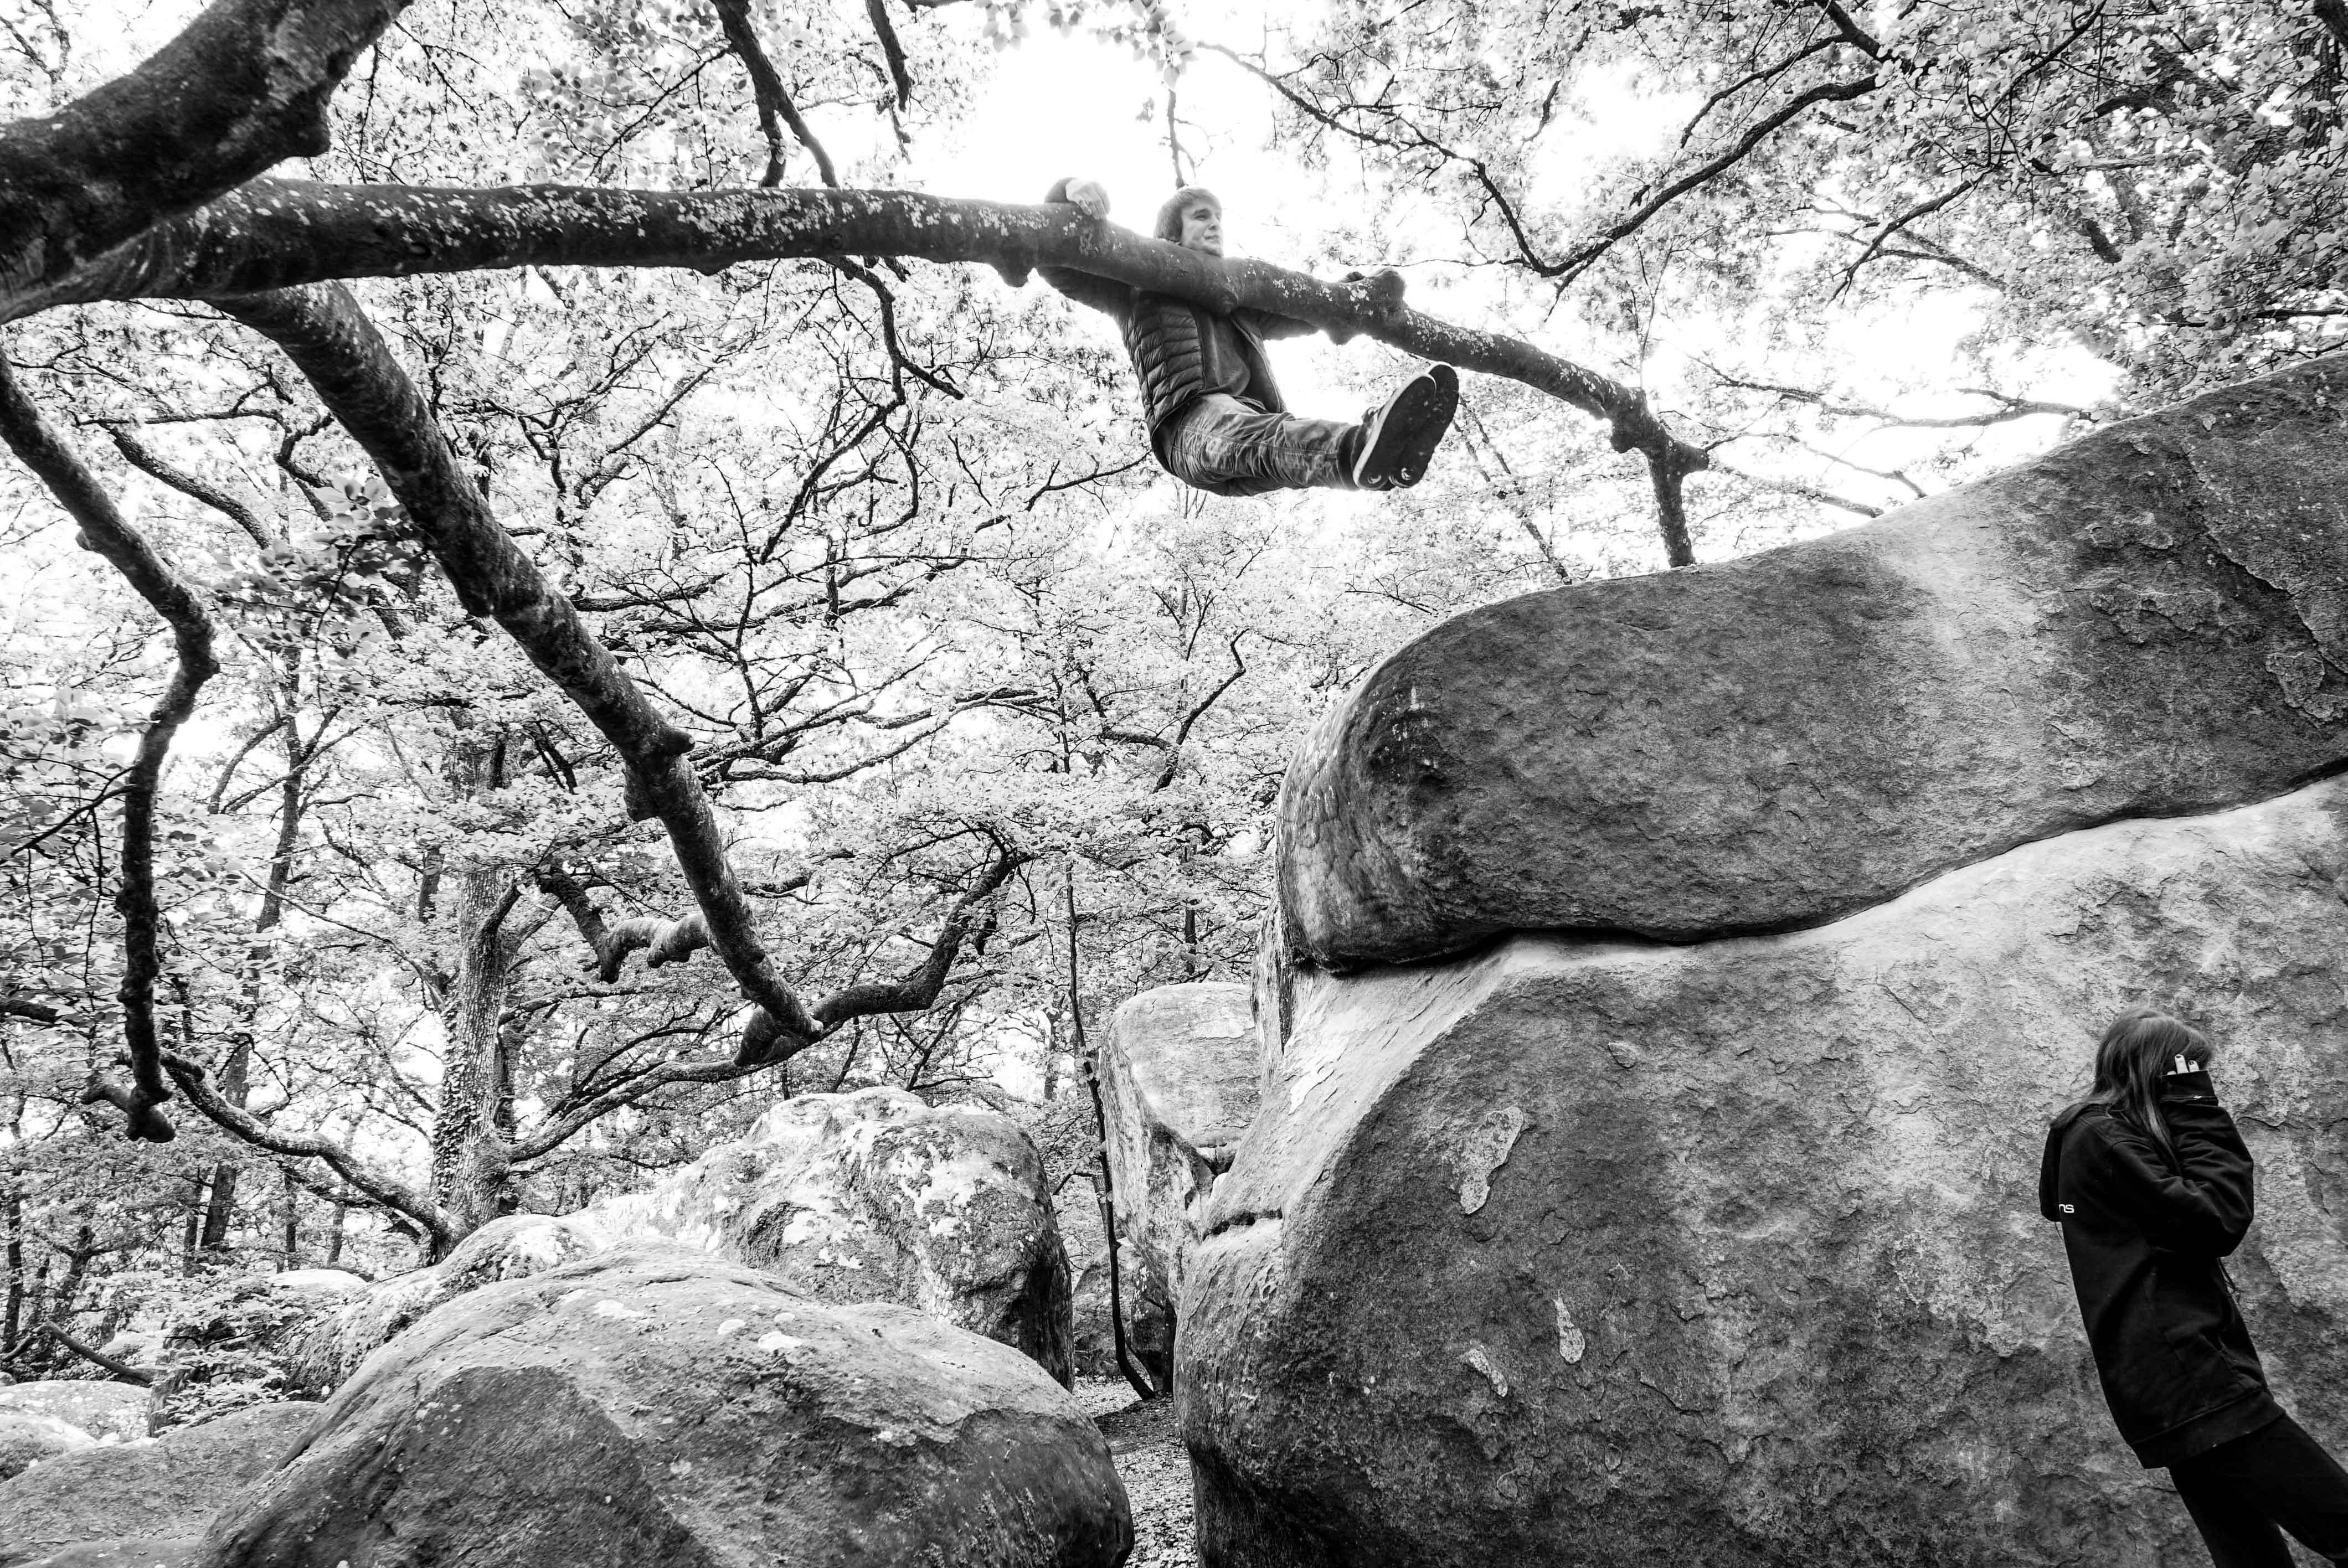 fontainbleau climbing 2016 mike brindley-110